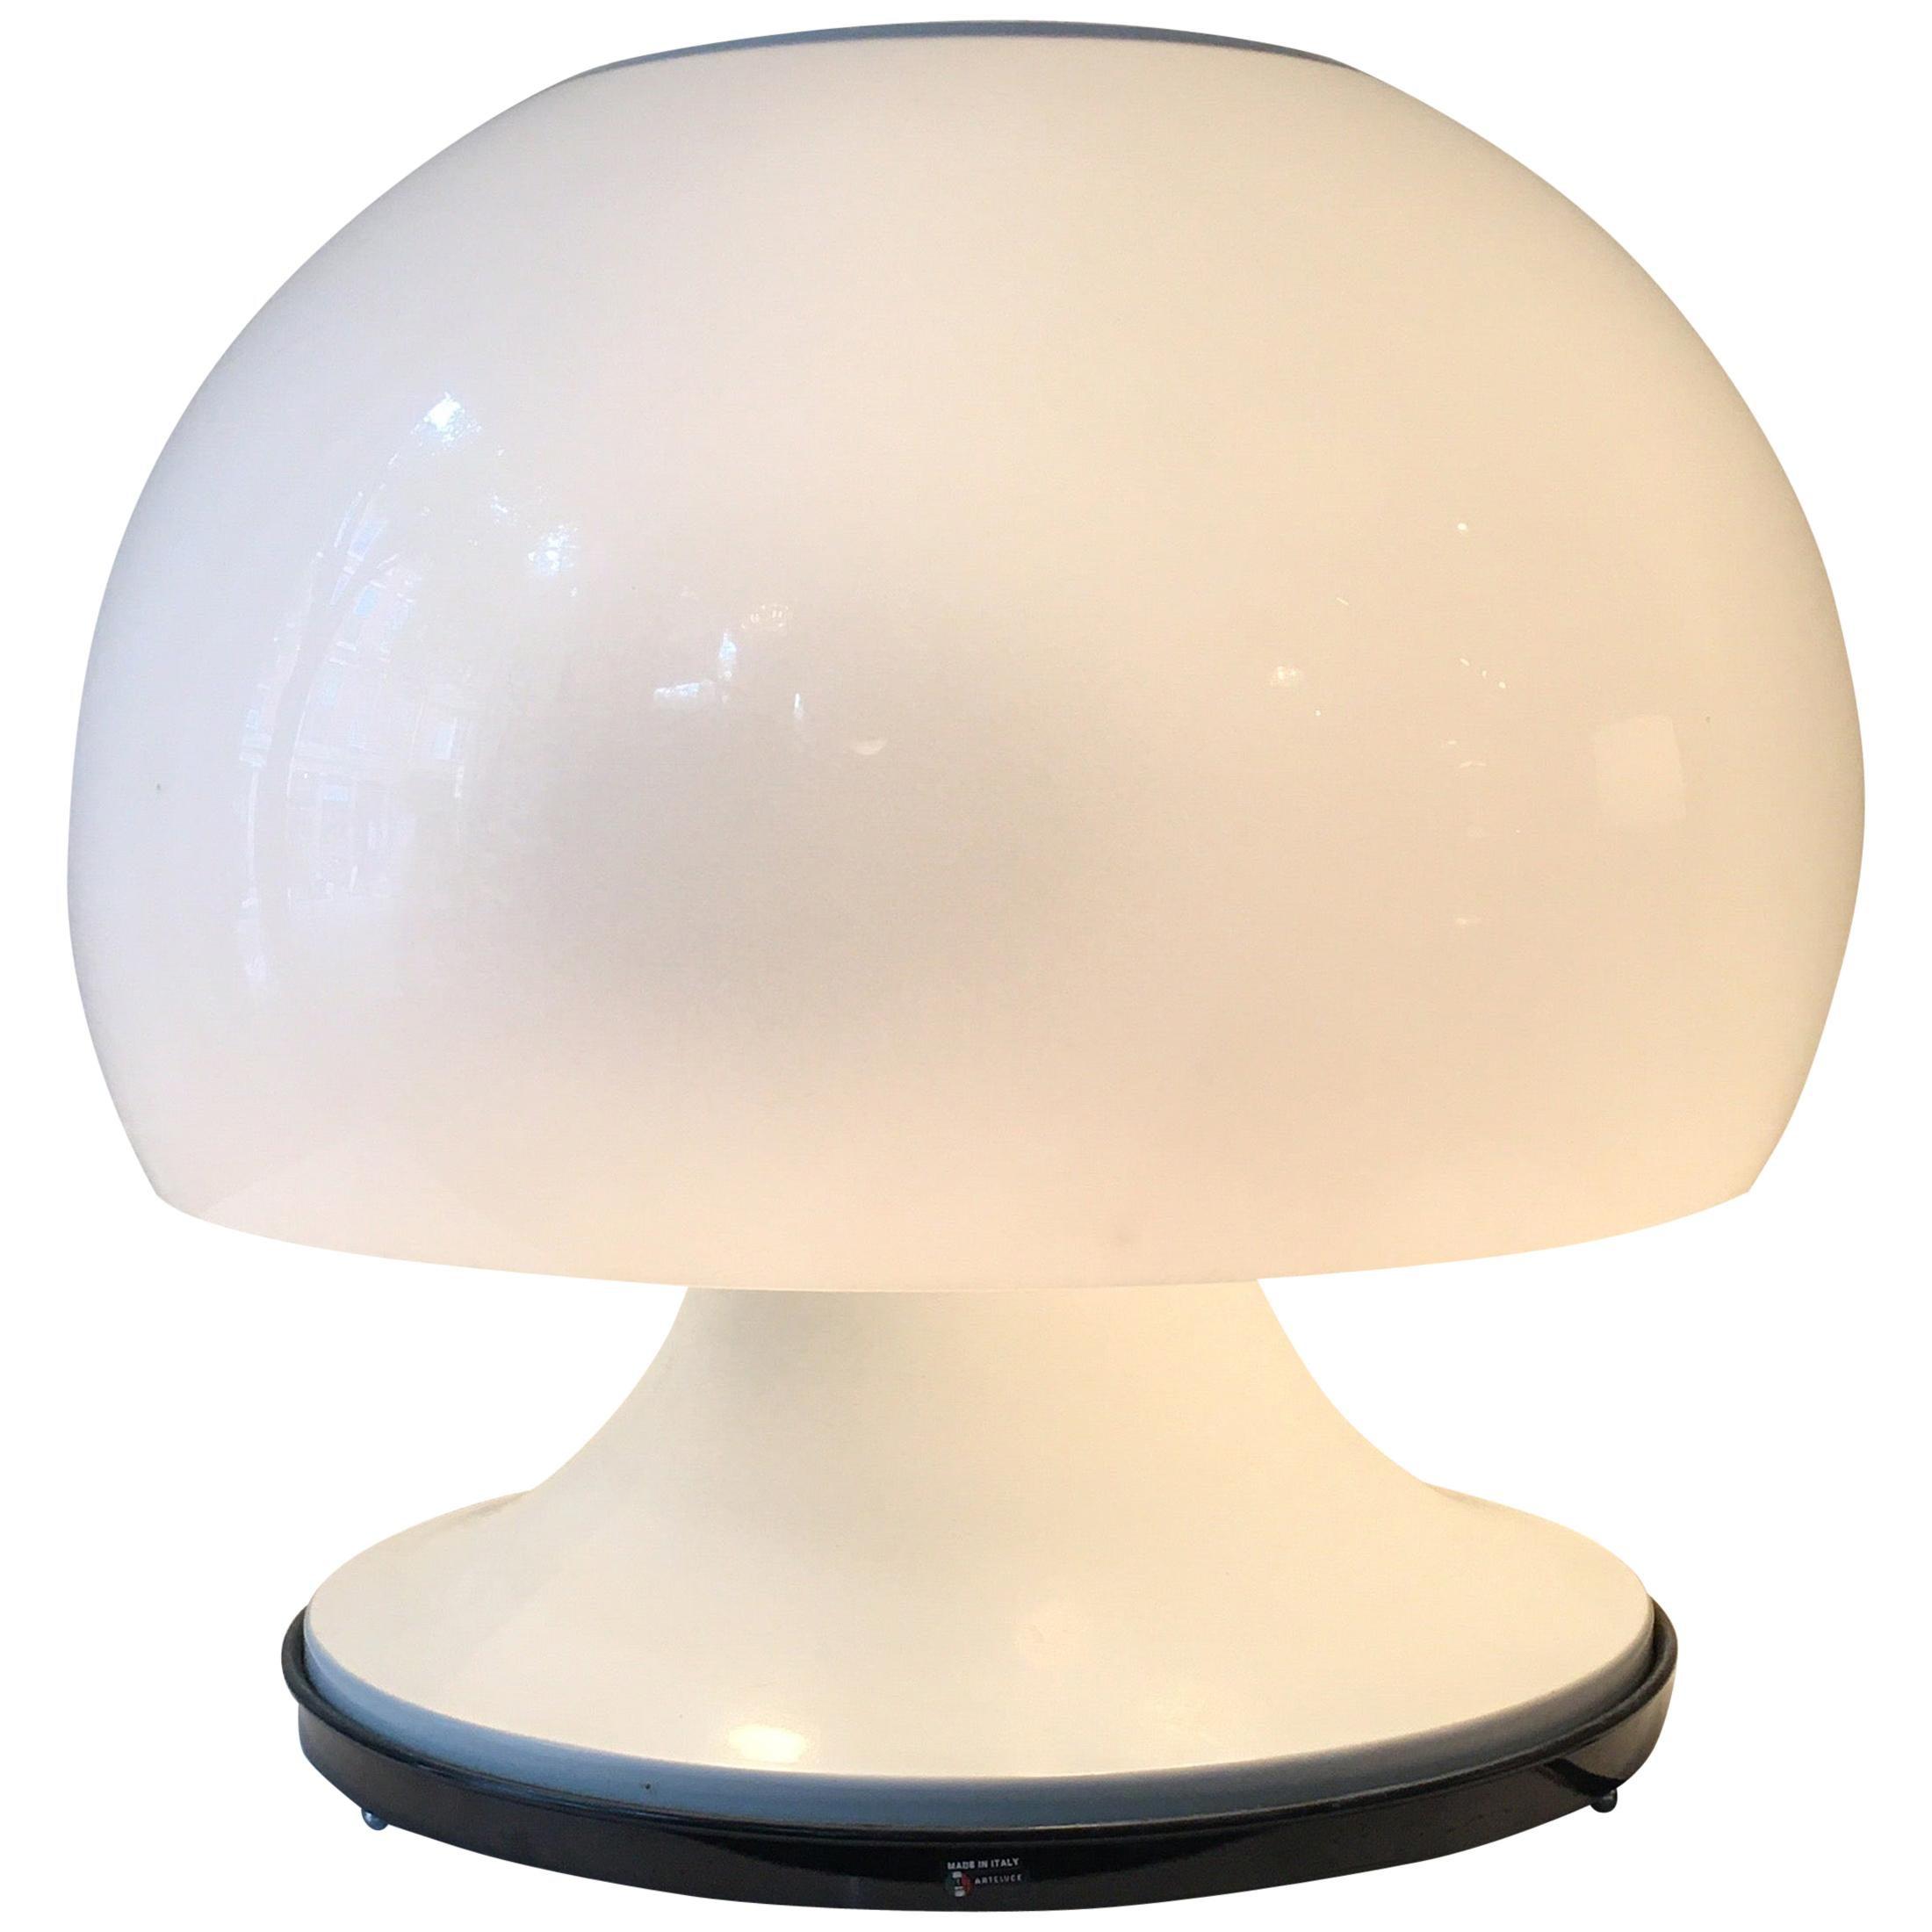 Gino Sarfatti Model 596 Table Lamp for Arteluce